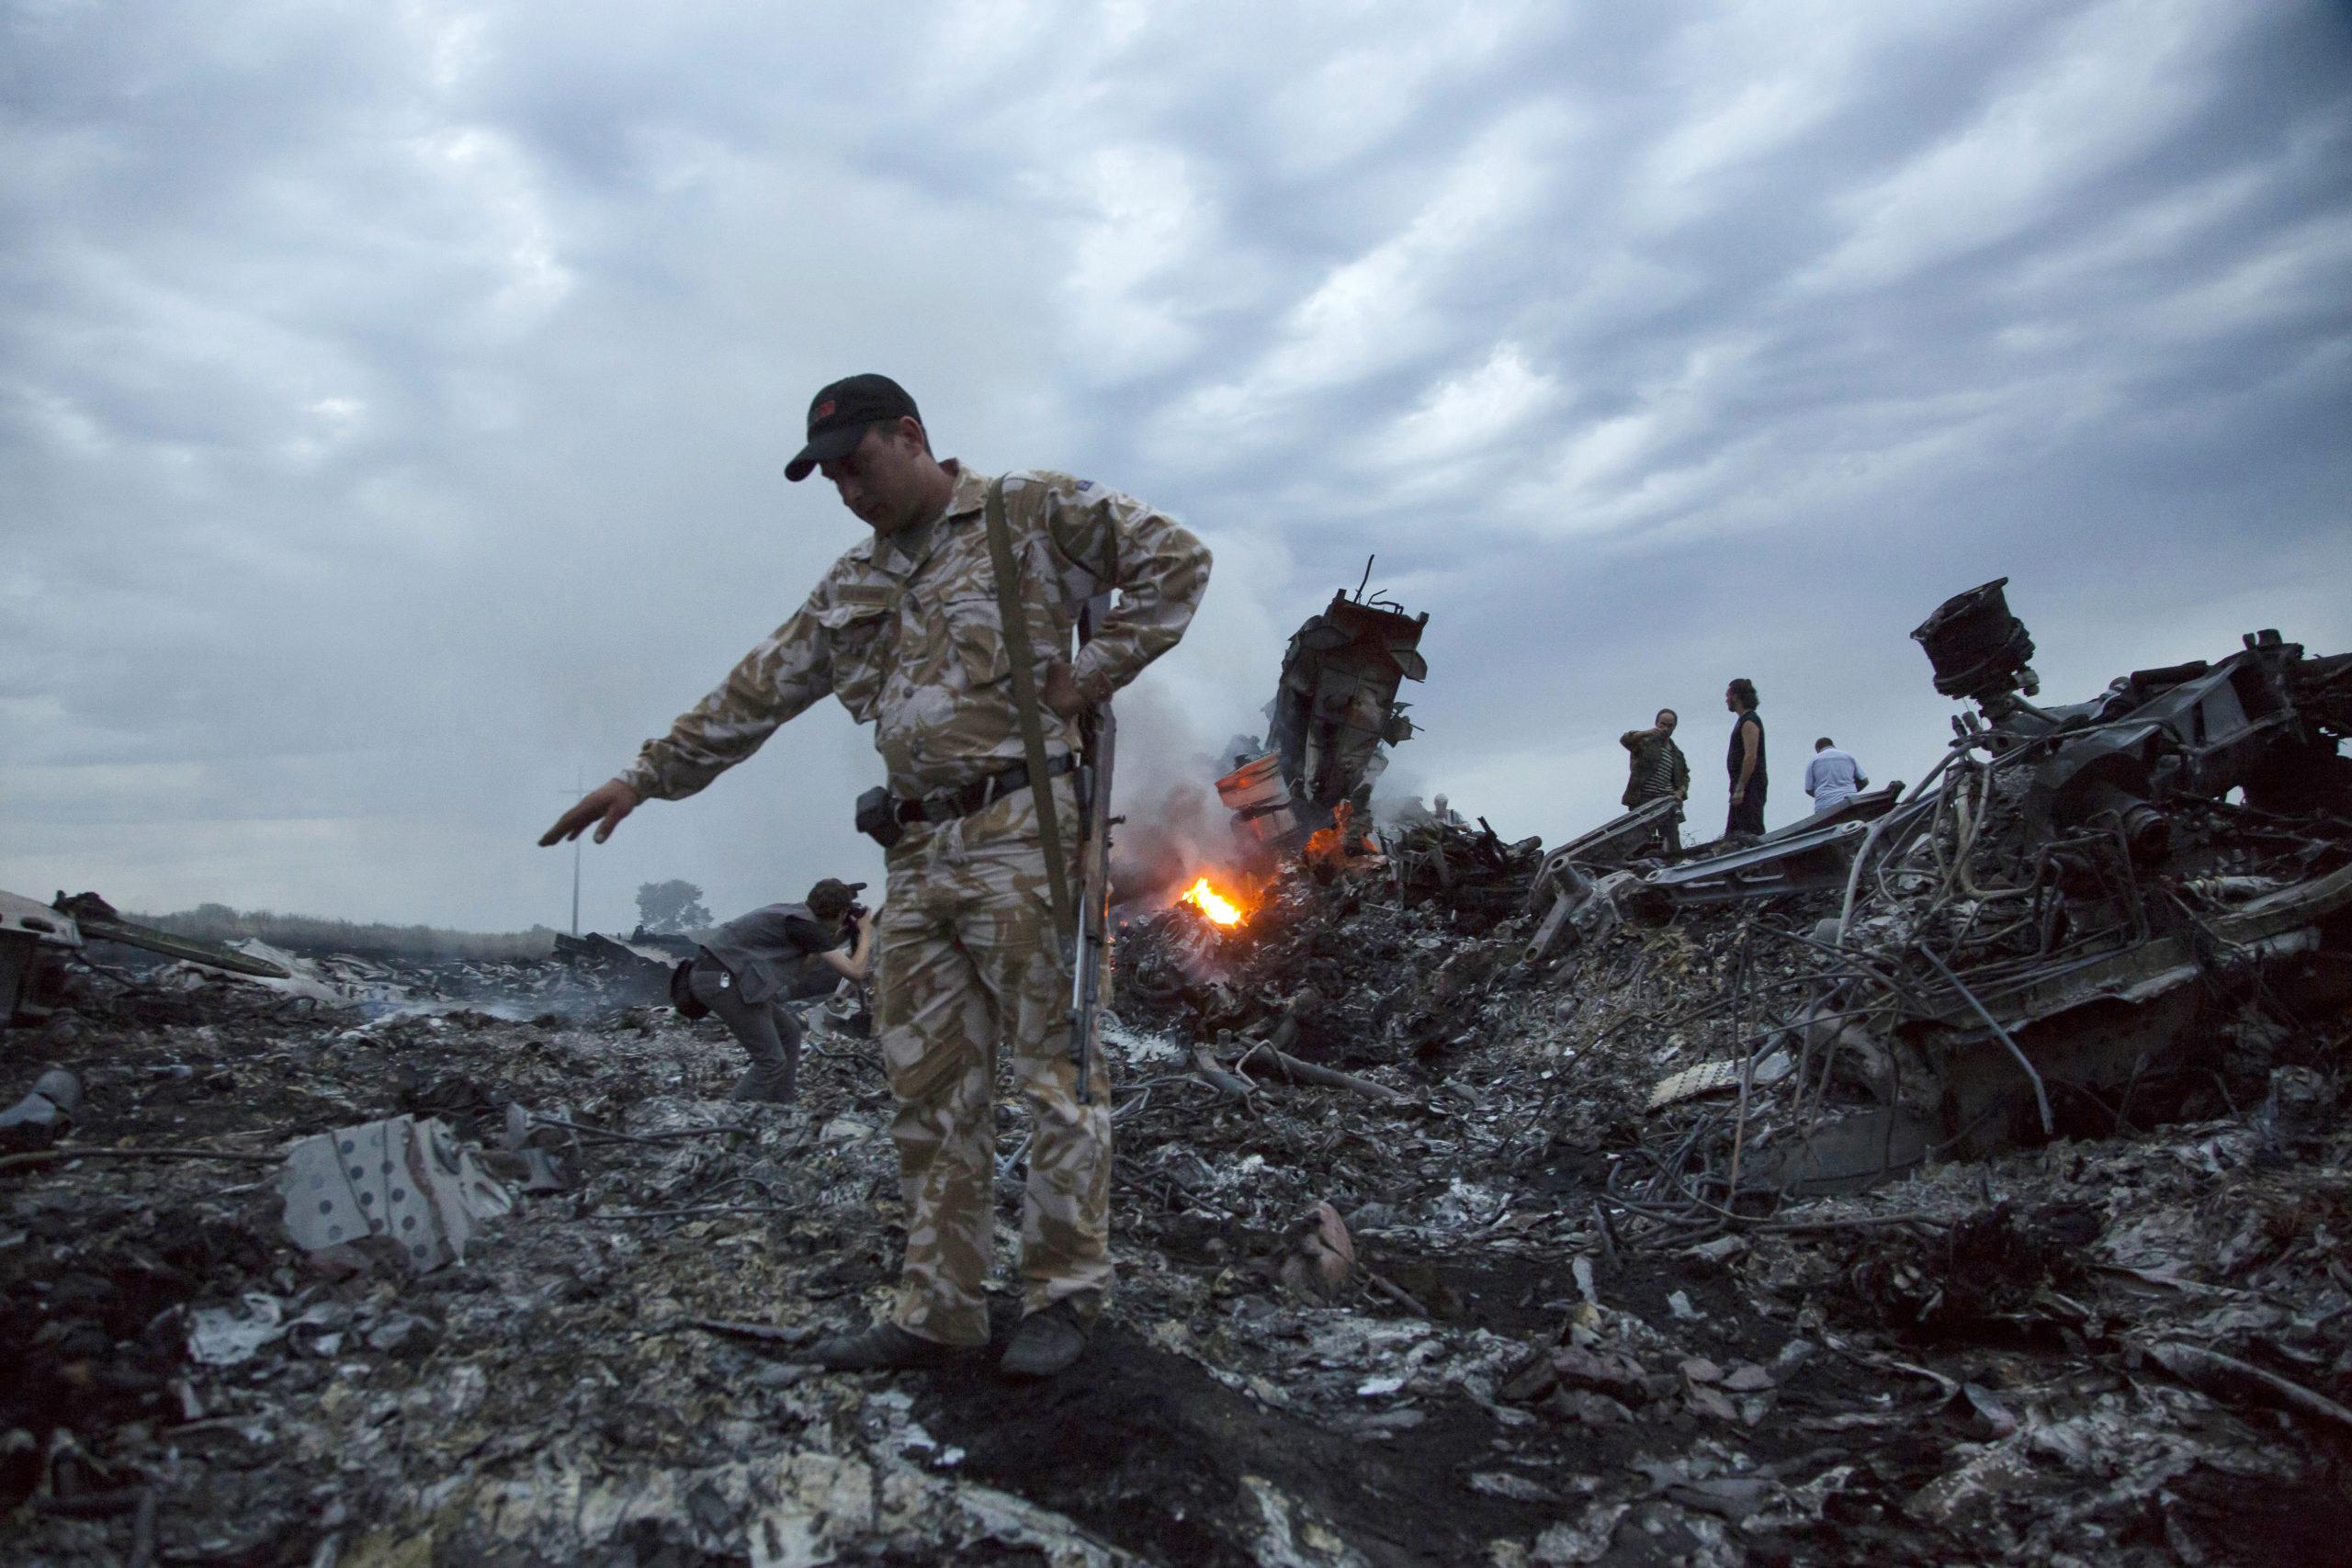 Debris at the crash site of a passenger plane near the village of Grabovo, Ukraine..